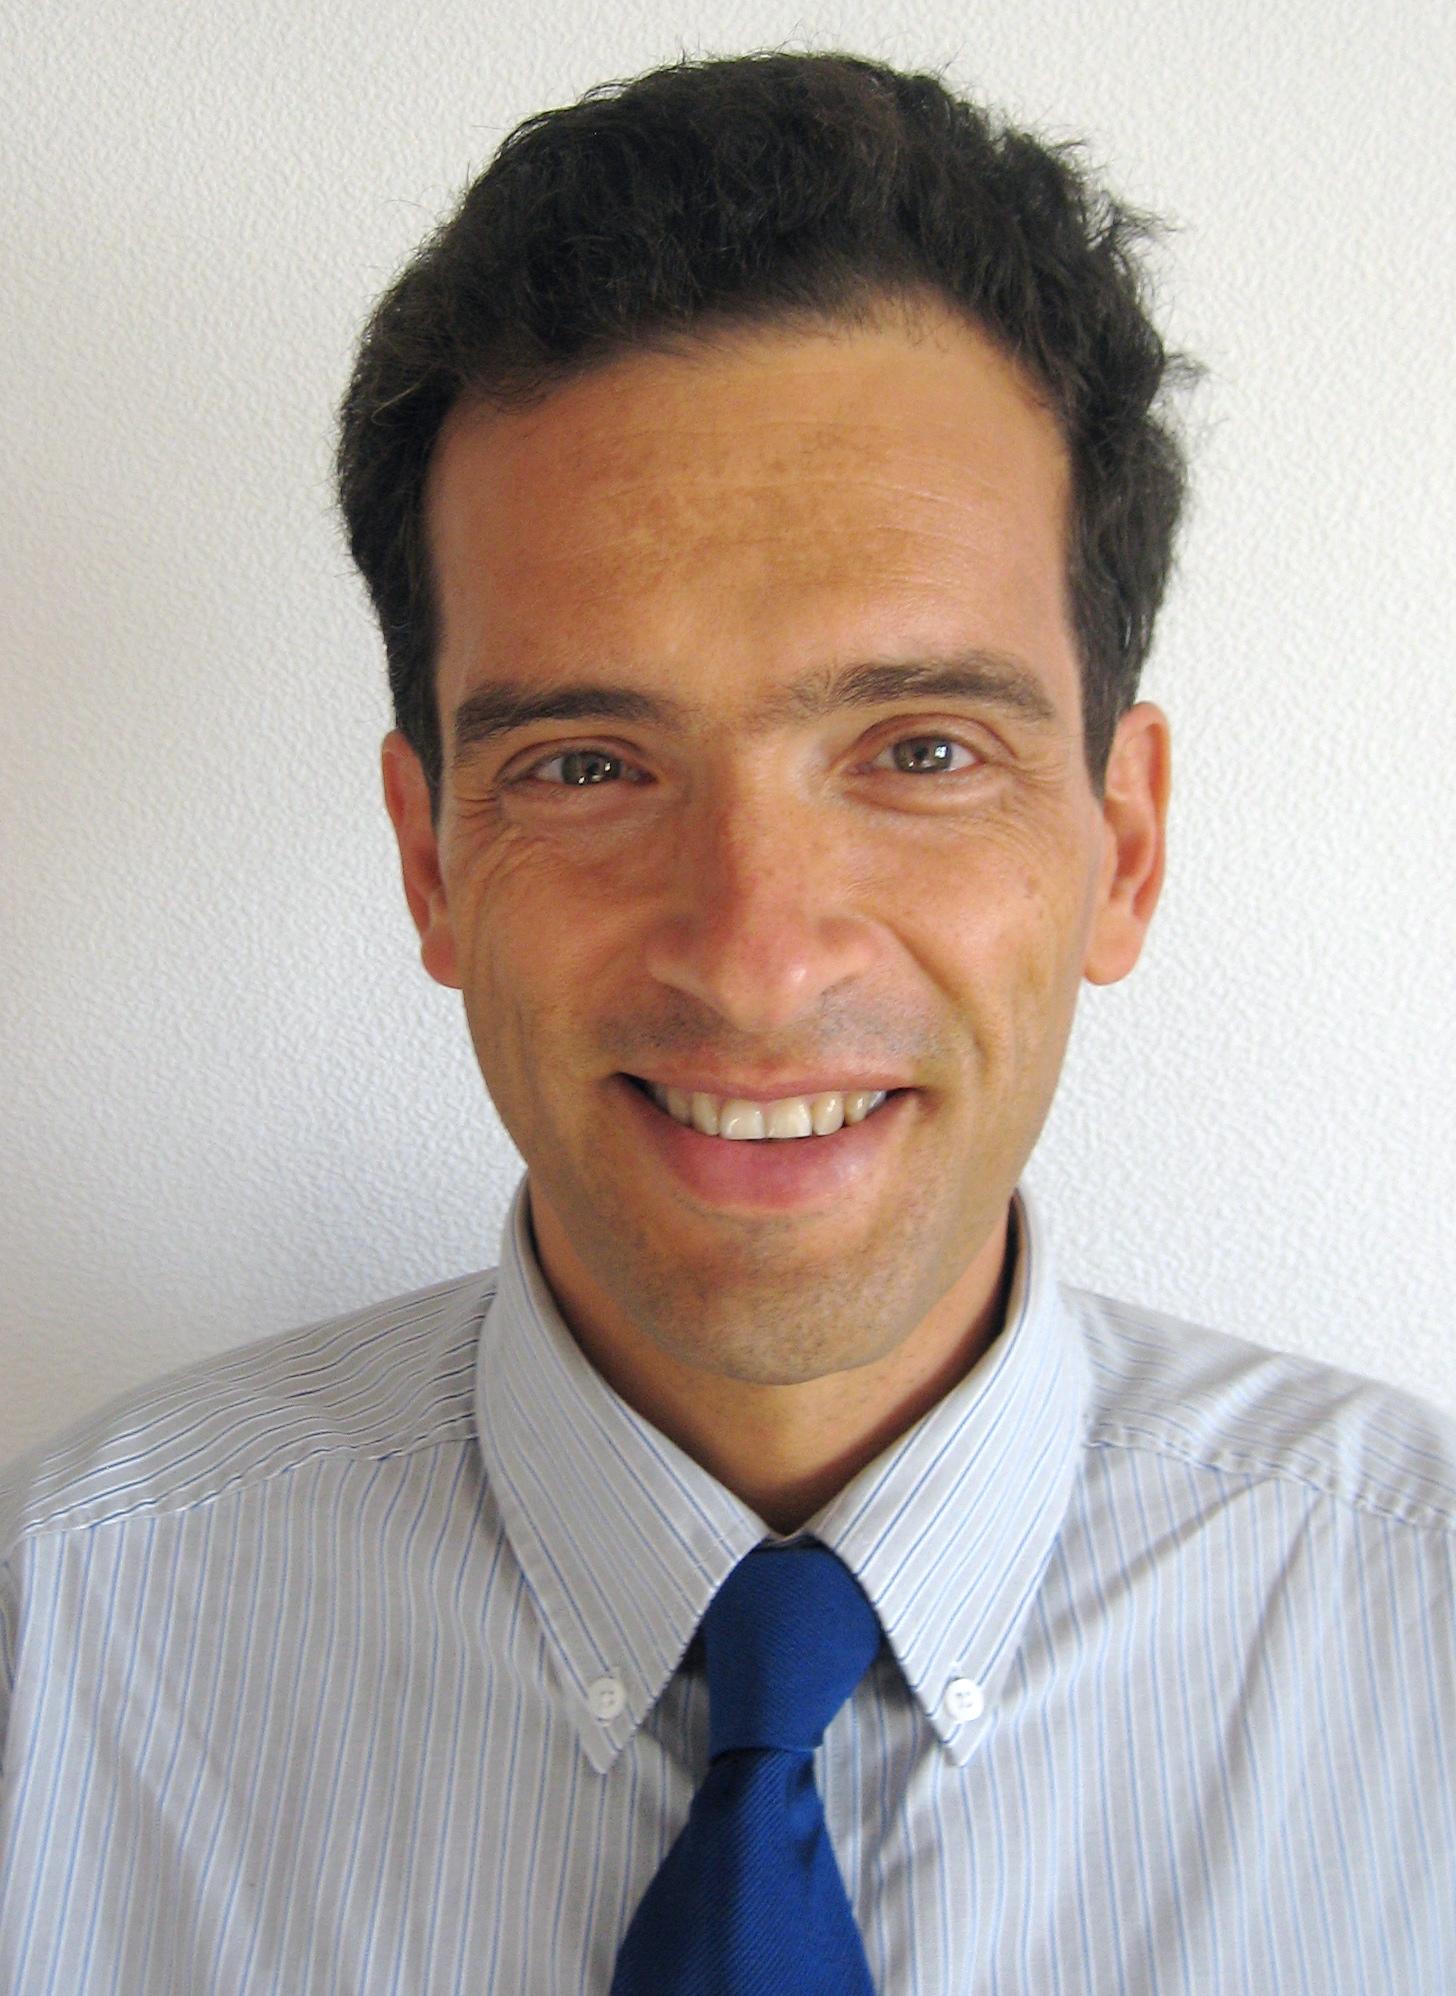 Olivier Brandouy